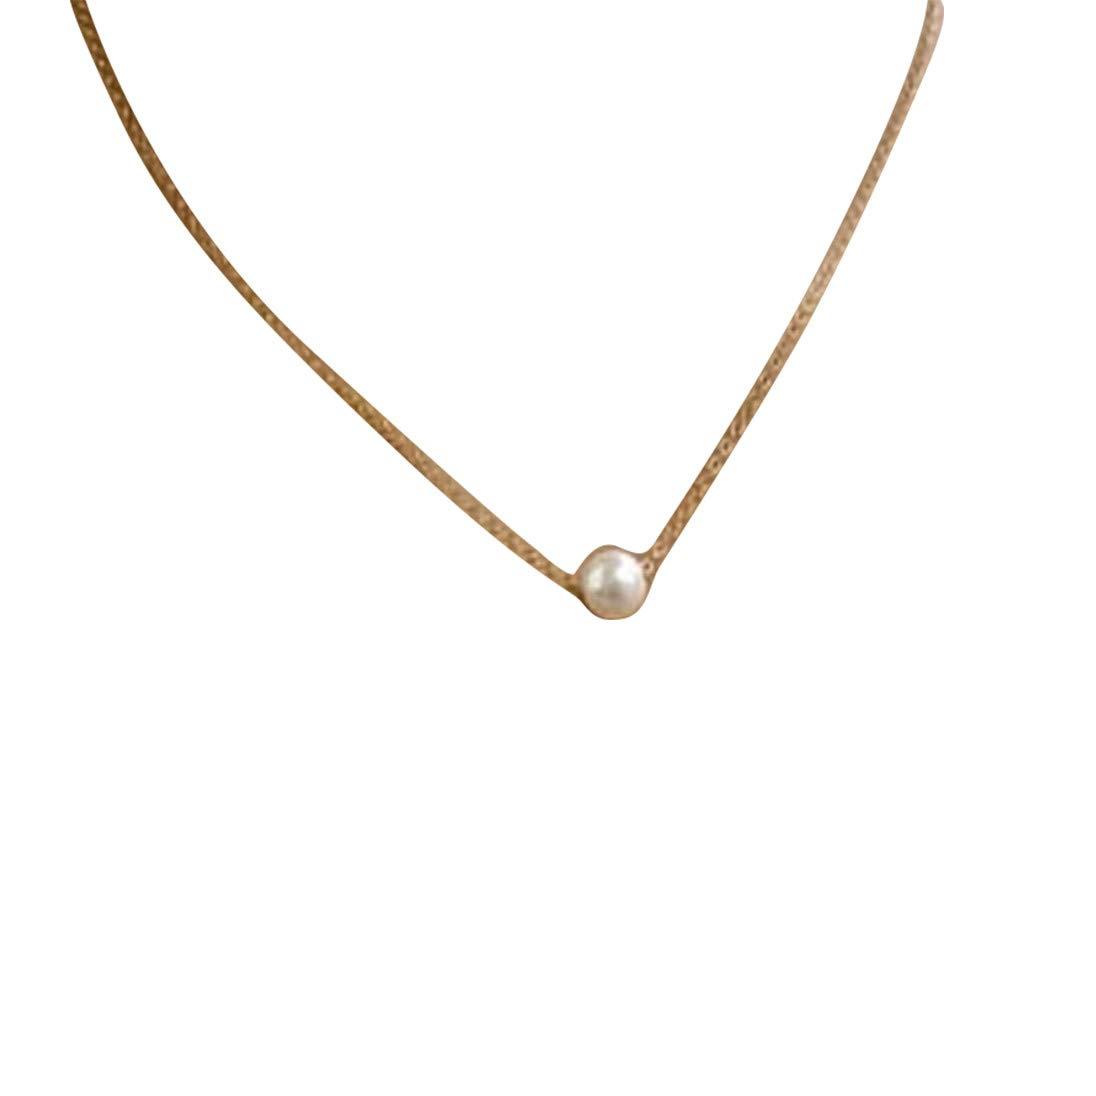 Start Women Fashion New Simple Pearl Bib Choker Necklace (Gold)